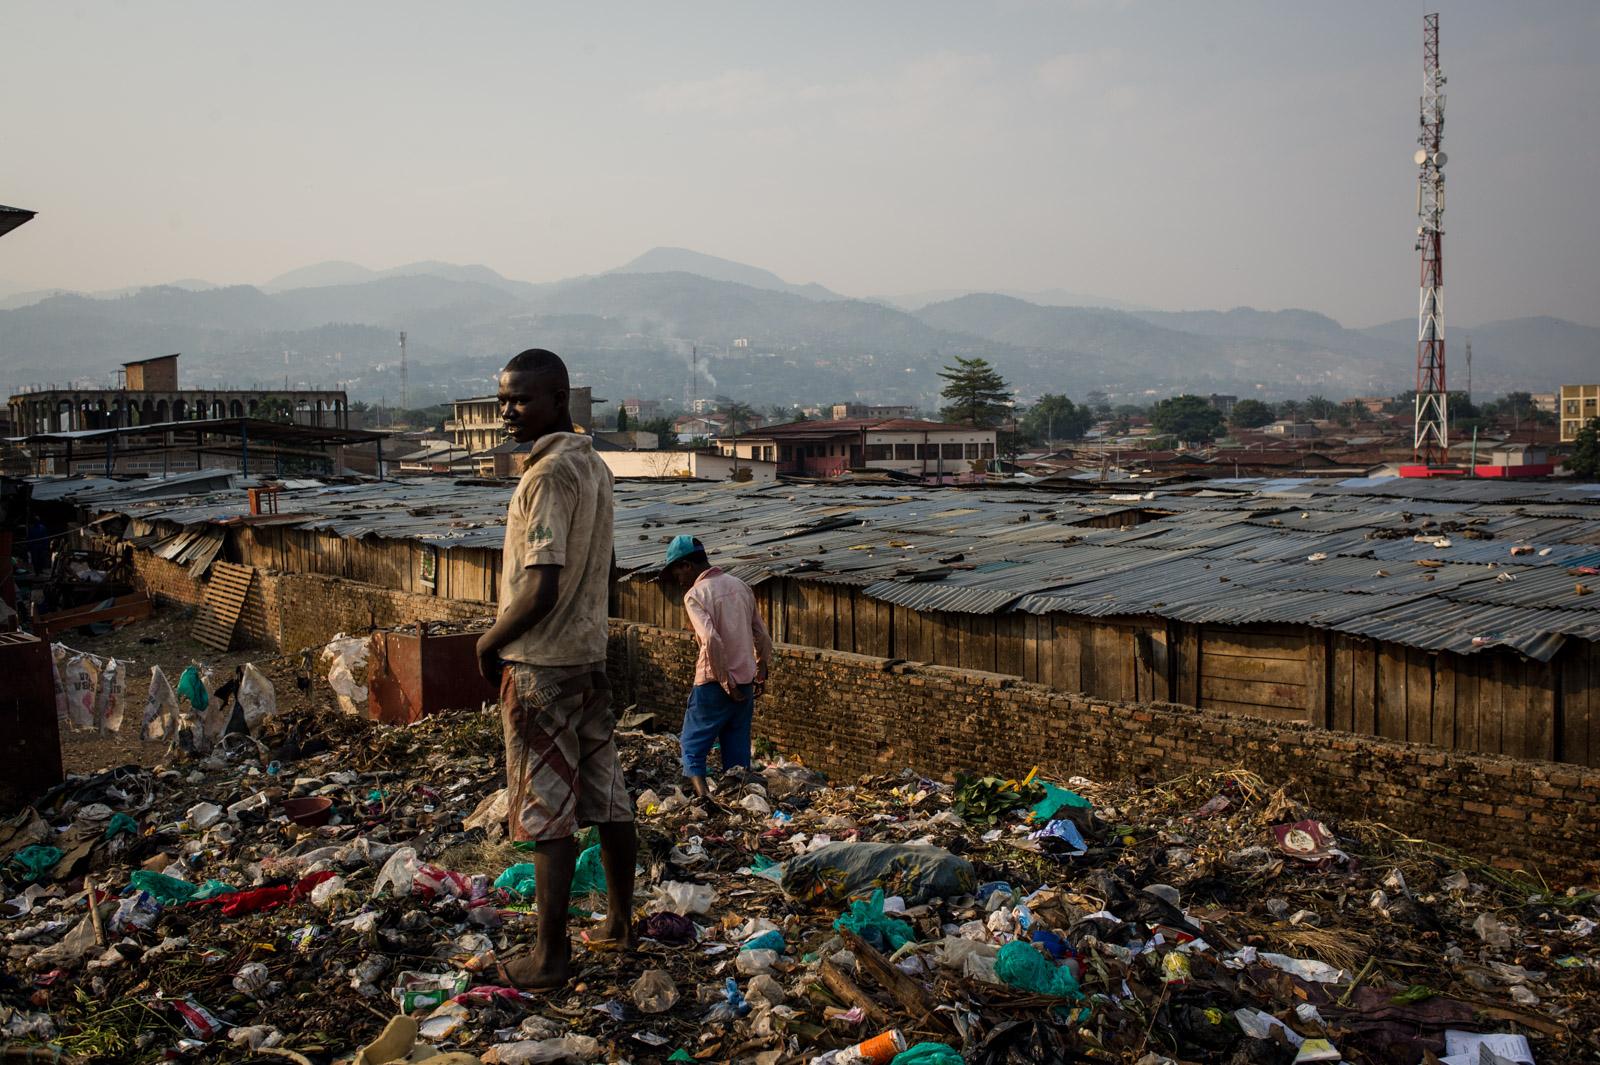 01_PEM_BDI_Burundi_5970.jpg